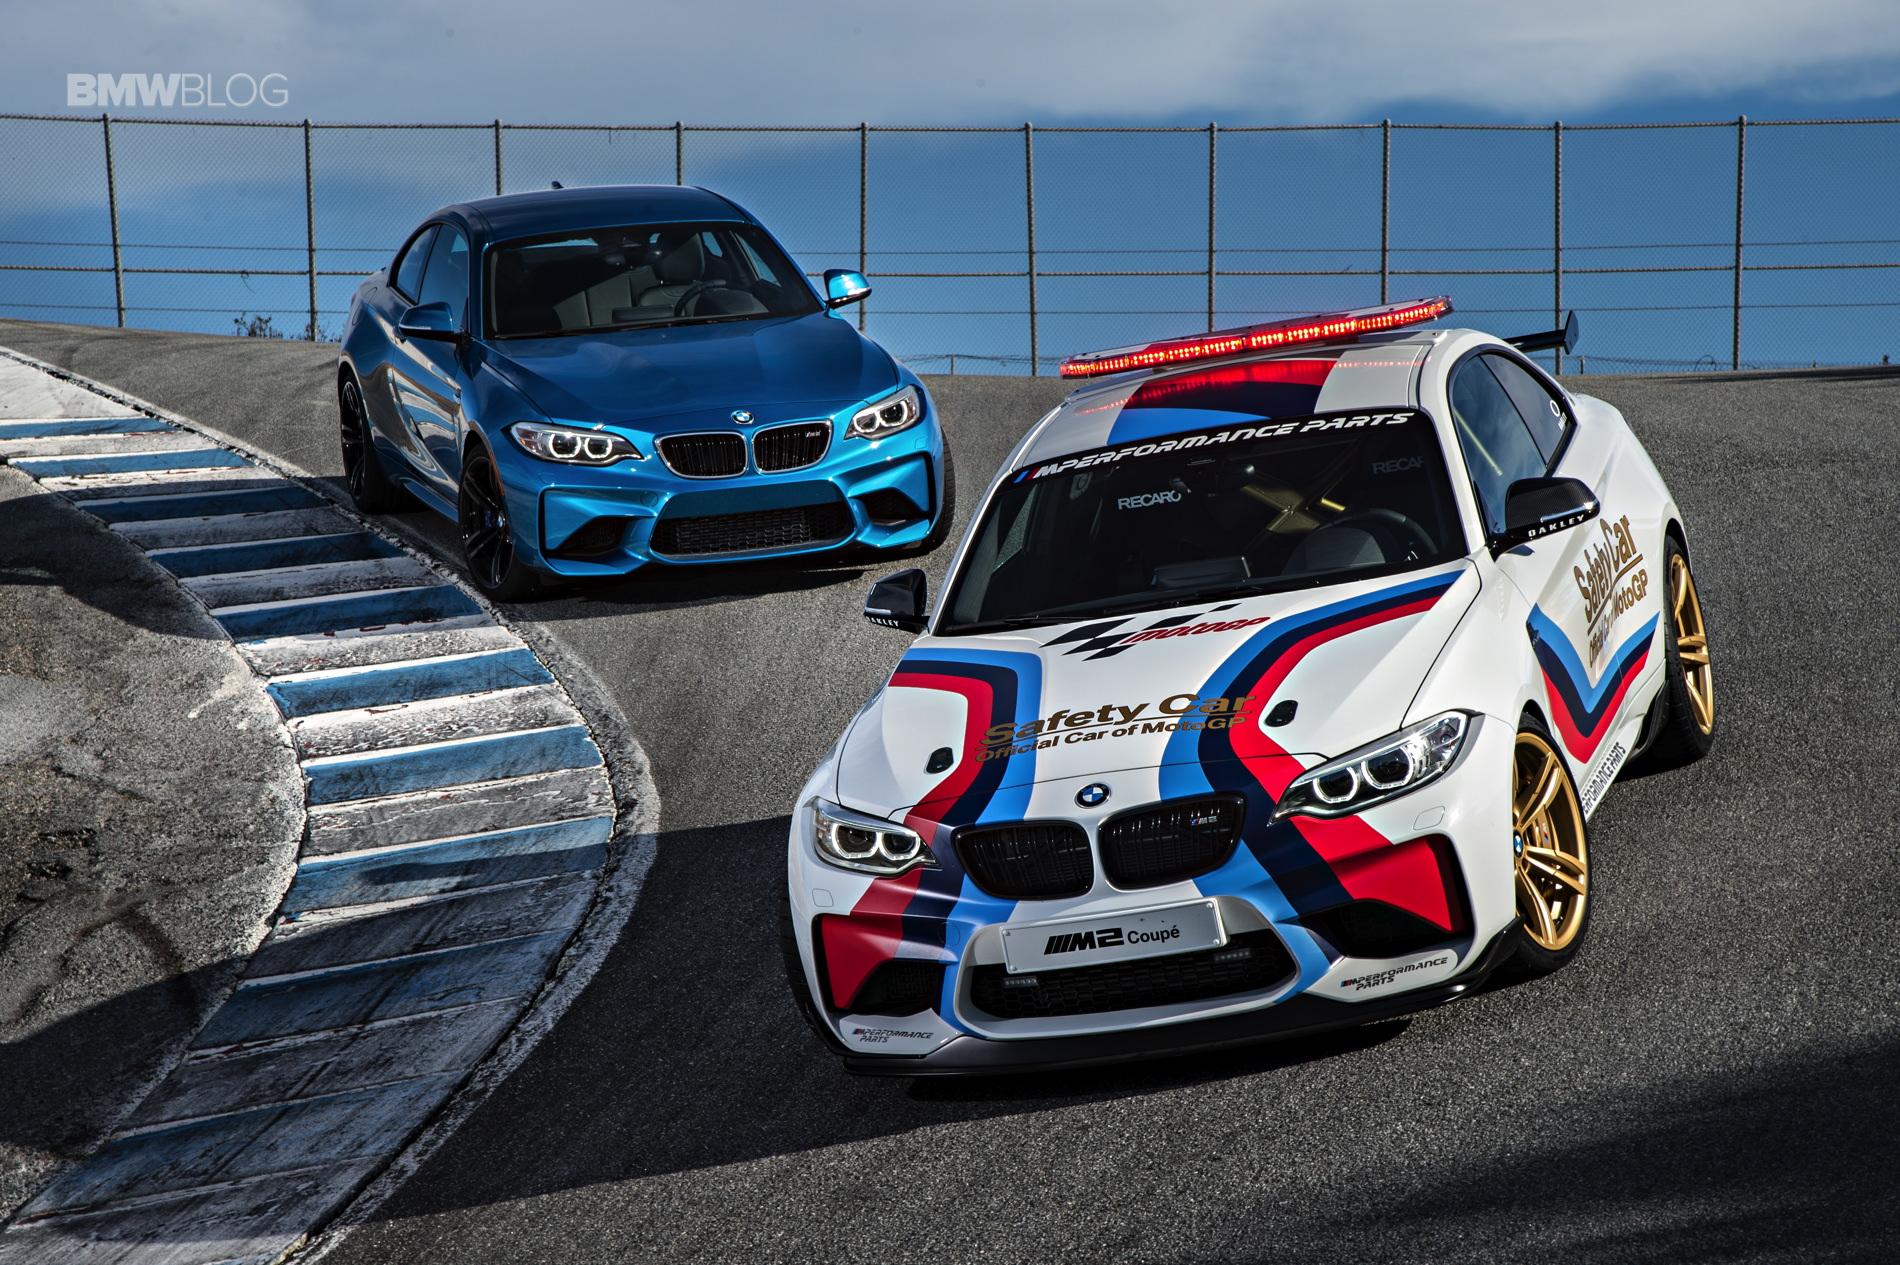 BMW-M2-Safety-Car-MotoGP-2016-autonovosti.me-6